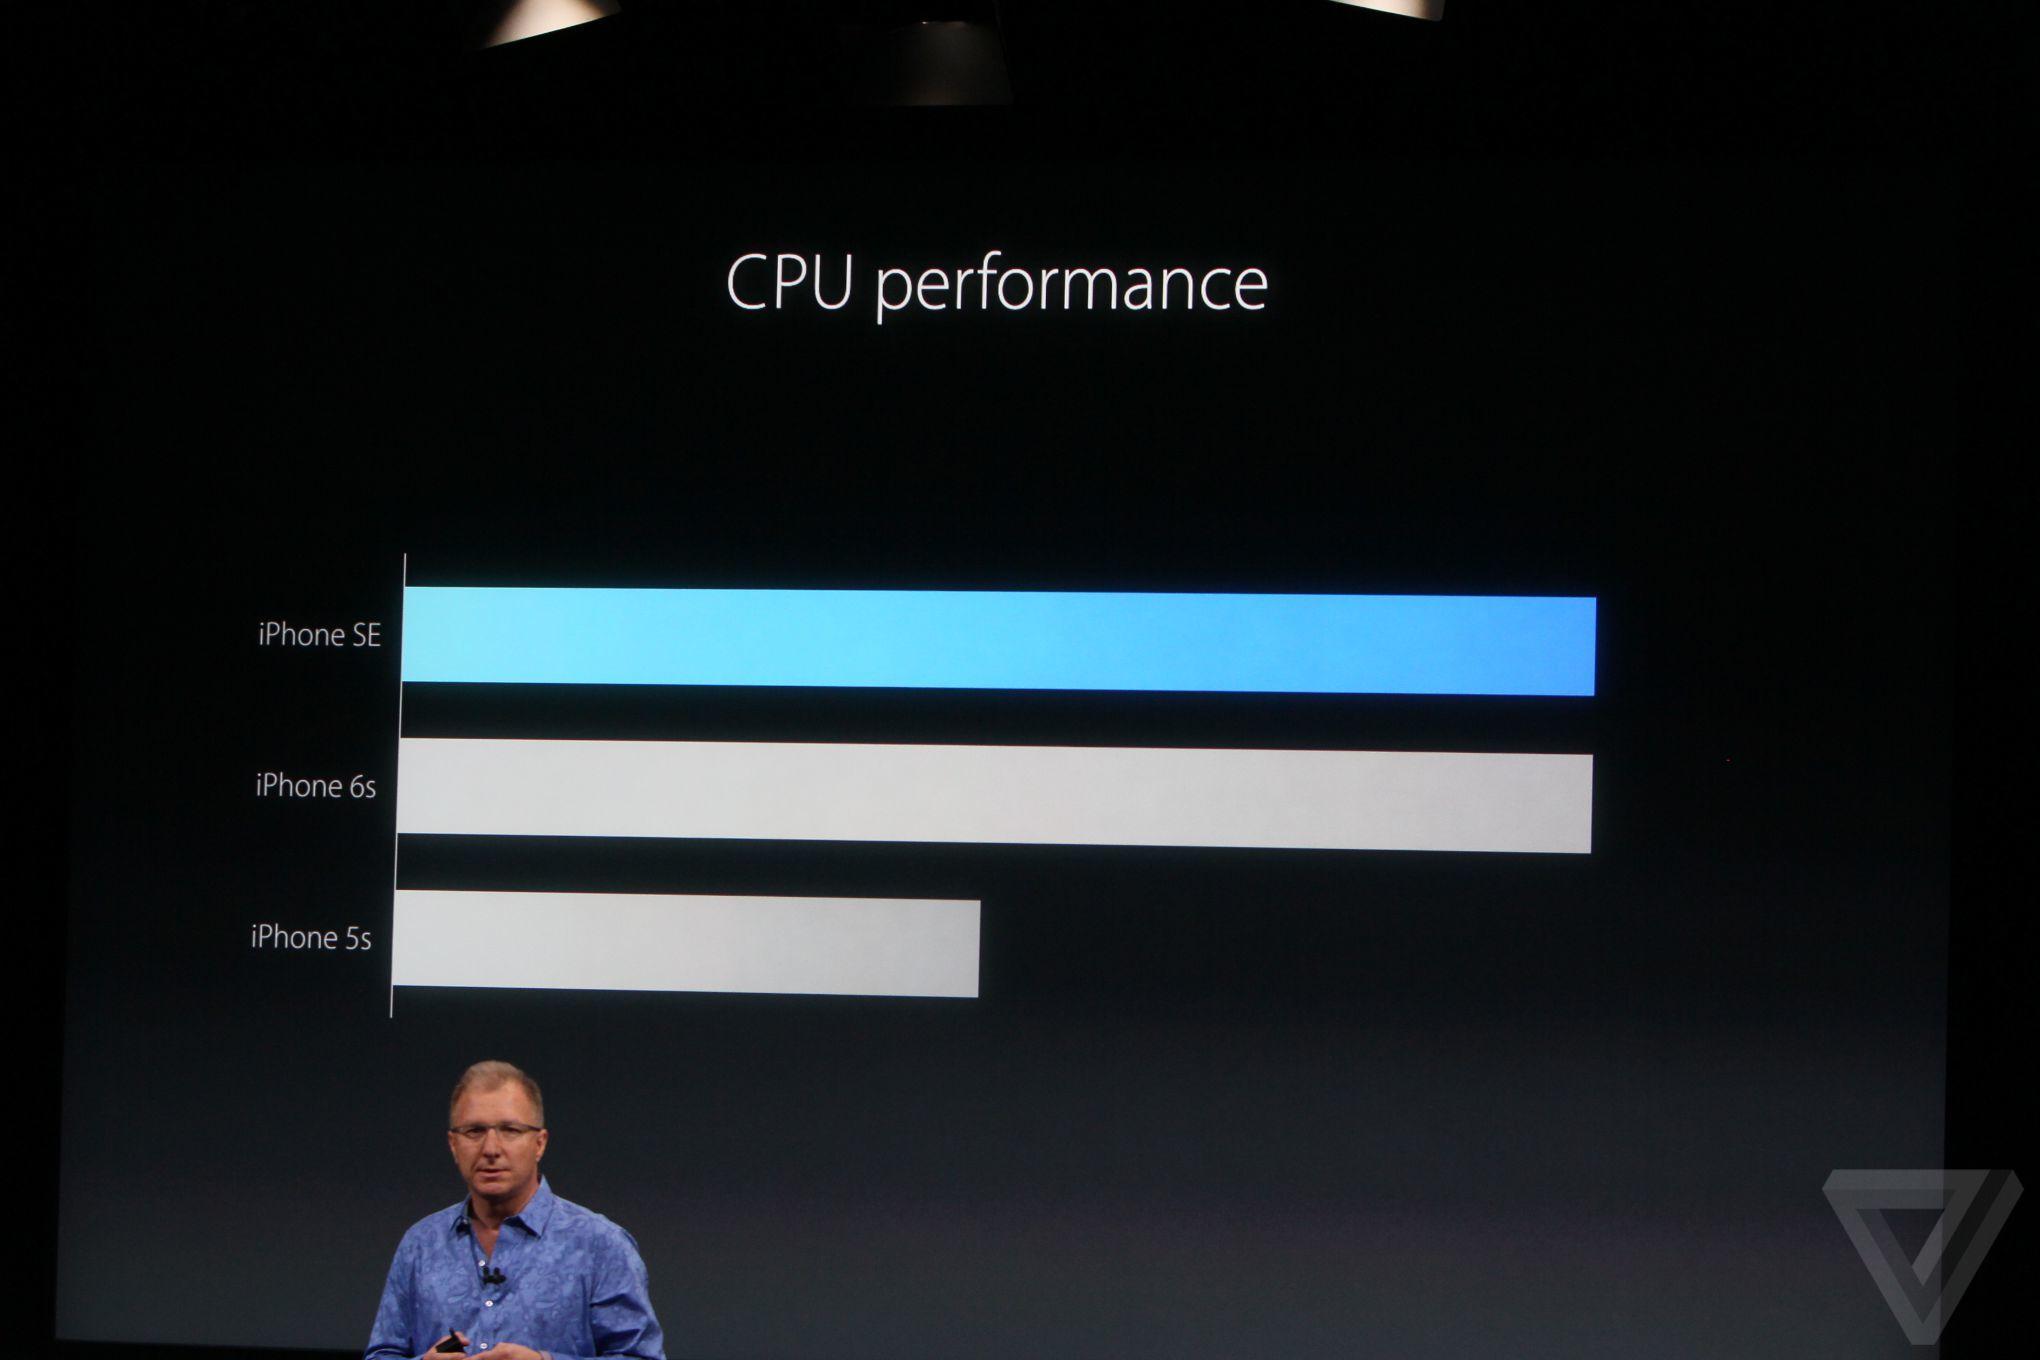 iPhone SE CPU performance